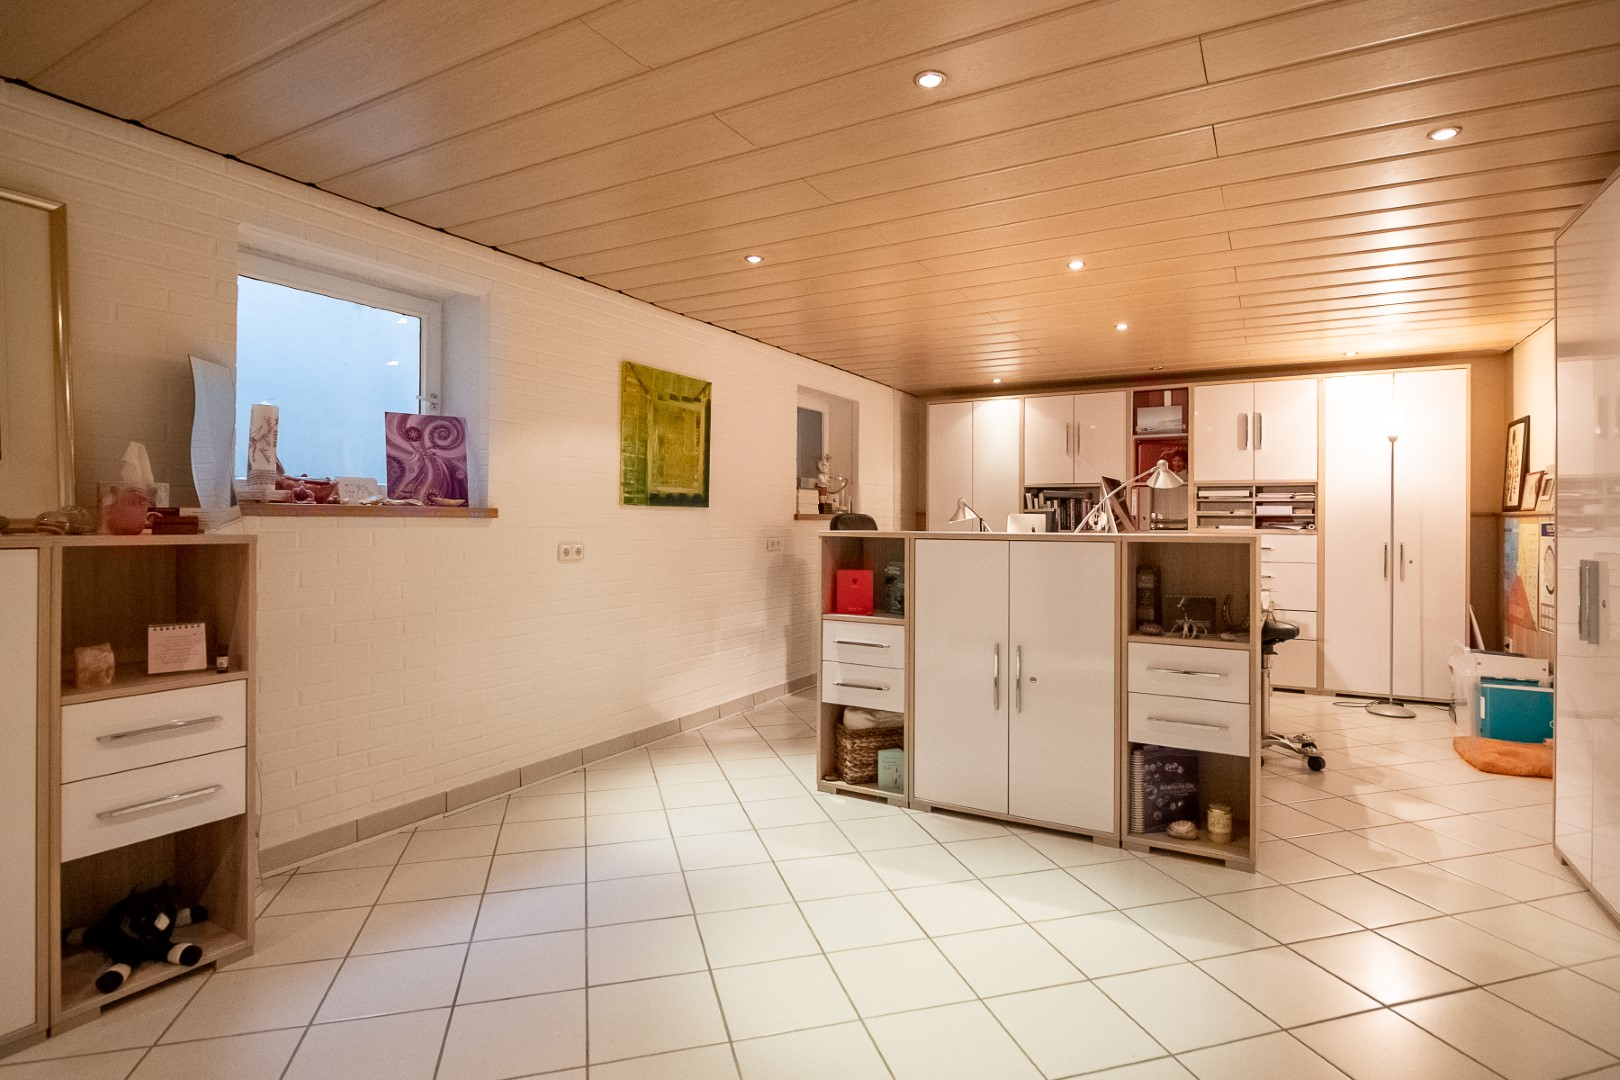 Immobilie Nr.0356 - DHH linksbündig mit Lang-Garage, Carport, Ausbaureserve.  - Bild 7.jpg